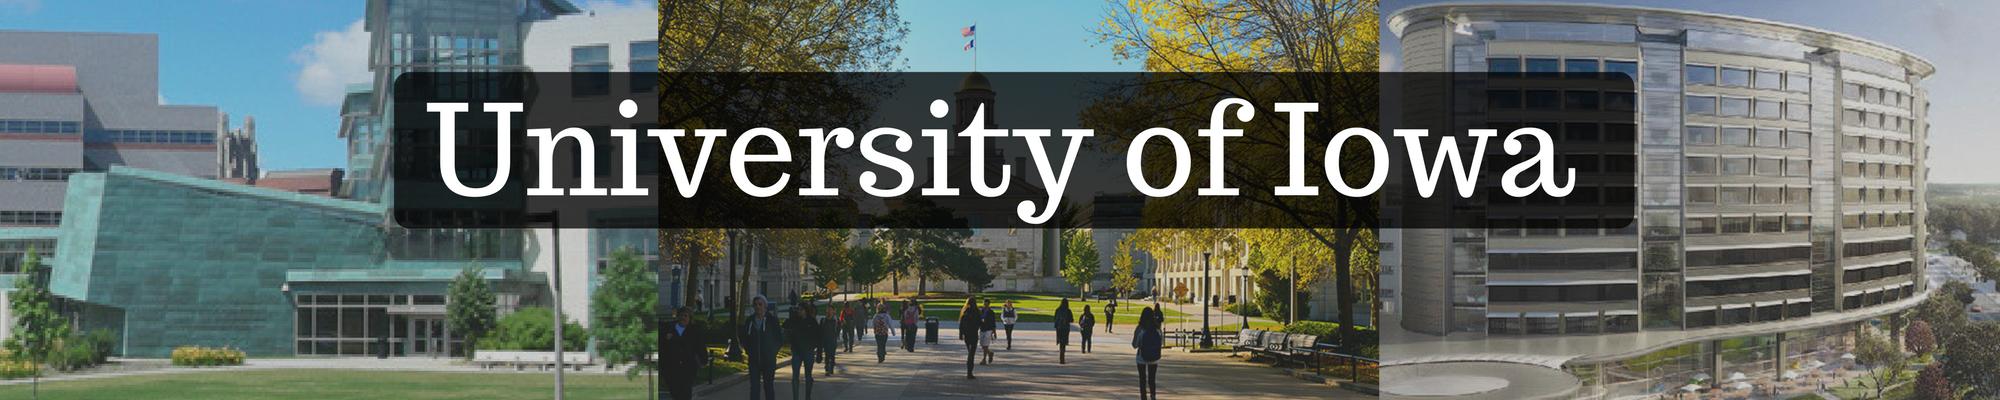 Links to University of Iowa